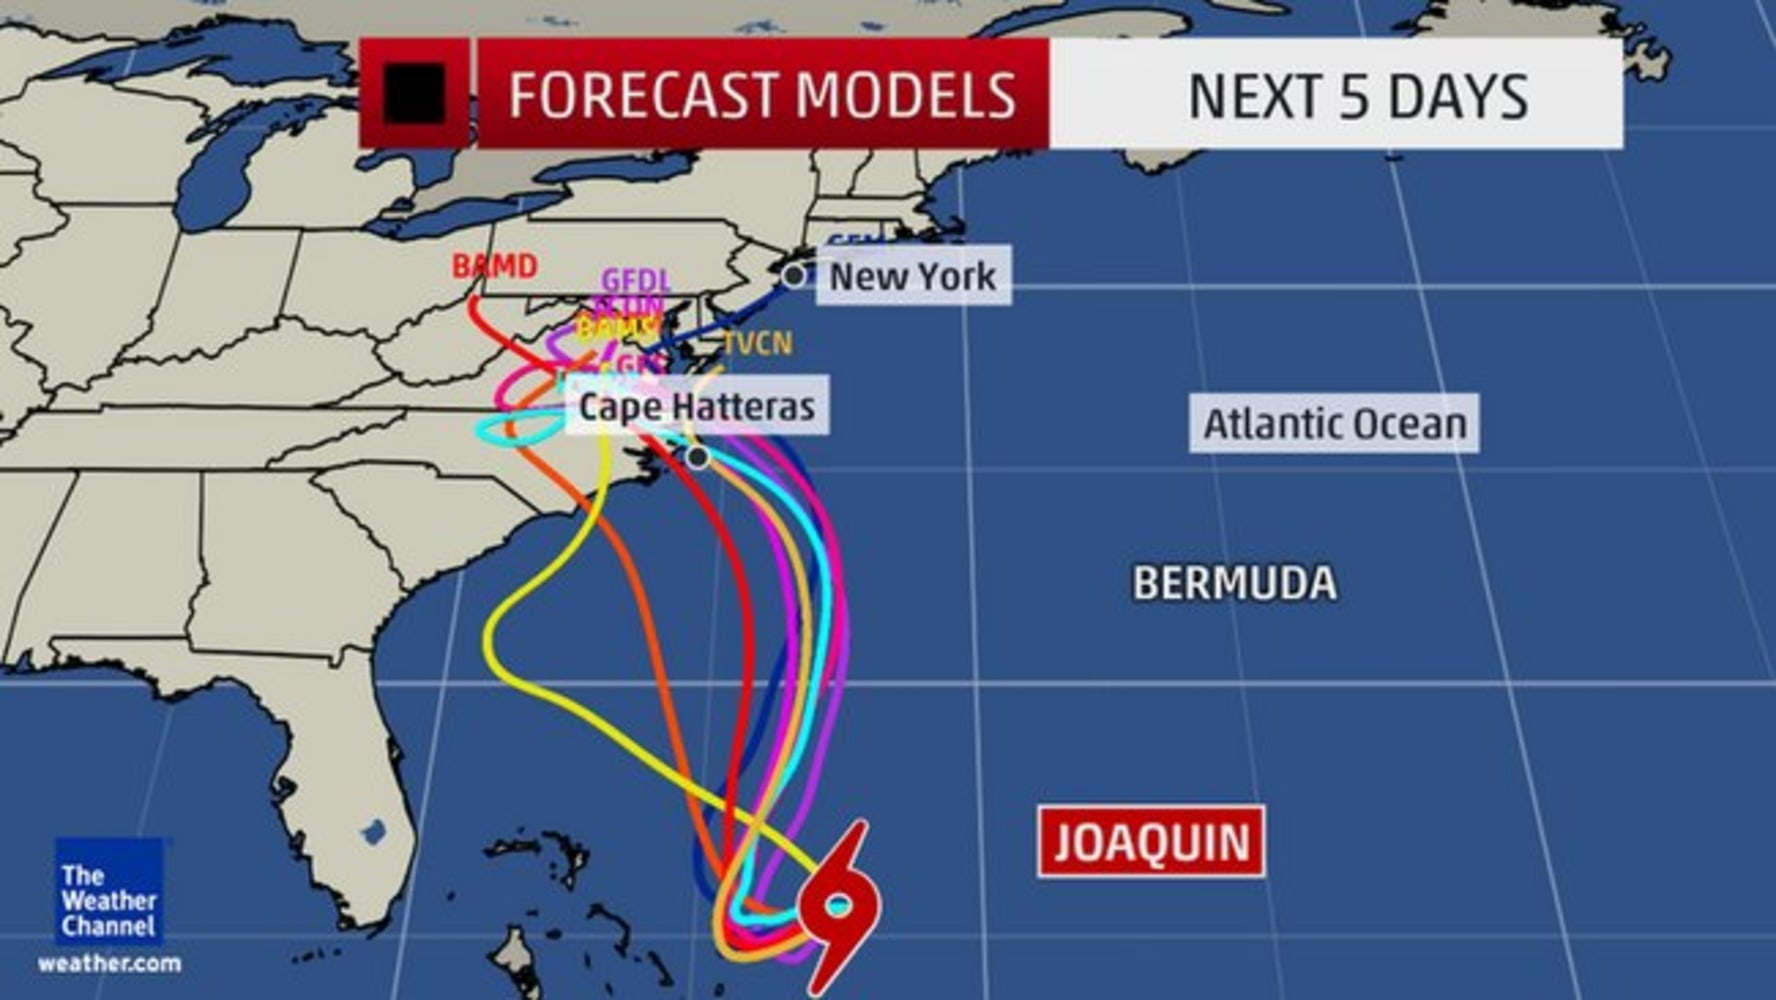 hurricane joaquin lurks as meteorologists disagree over